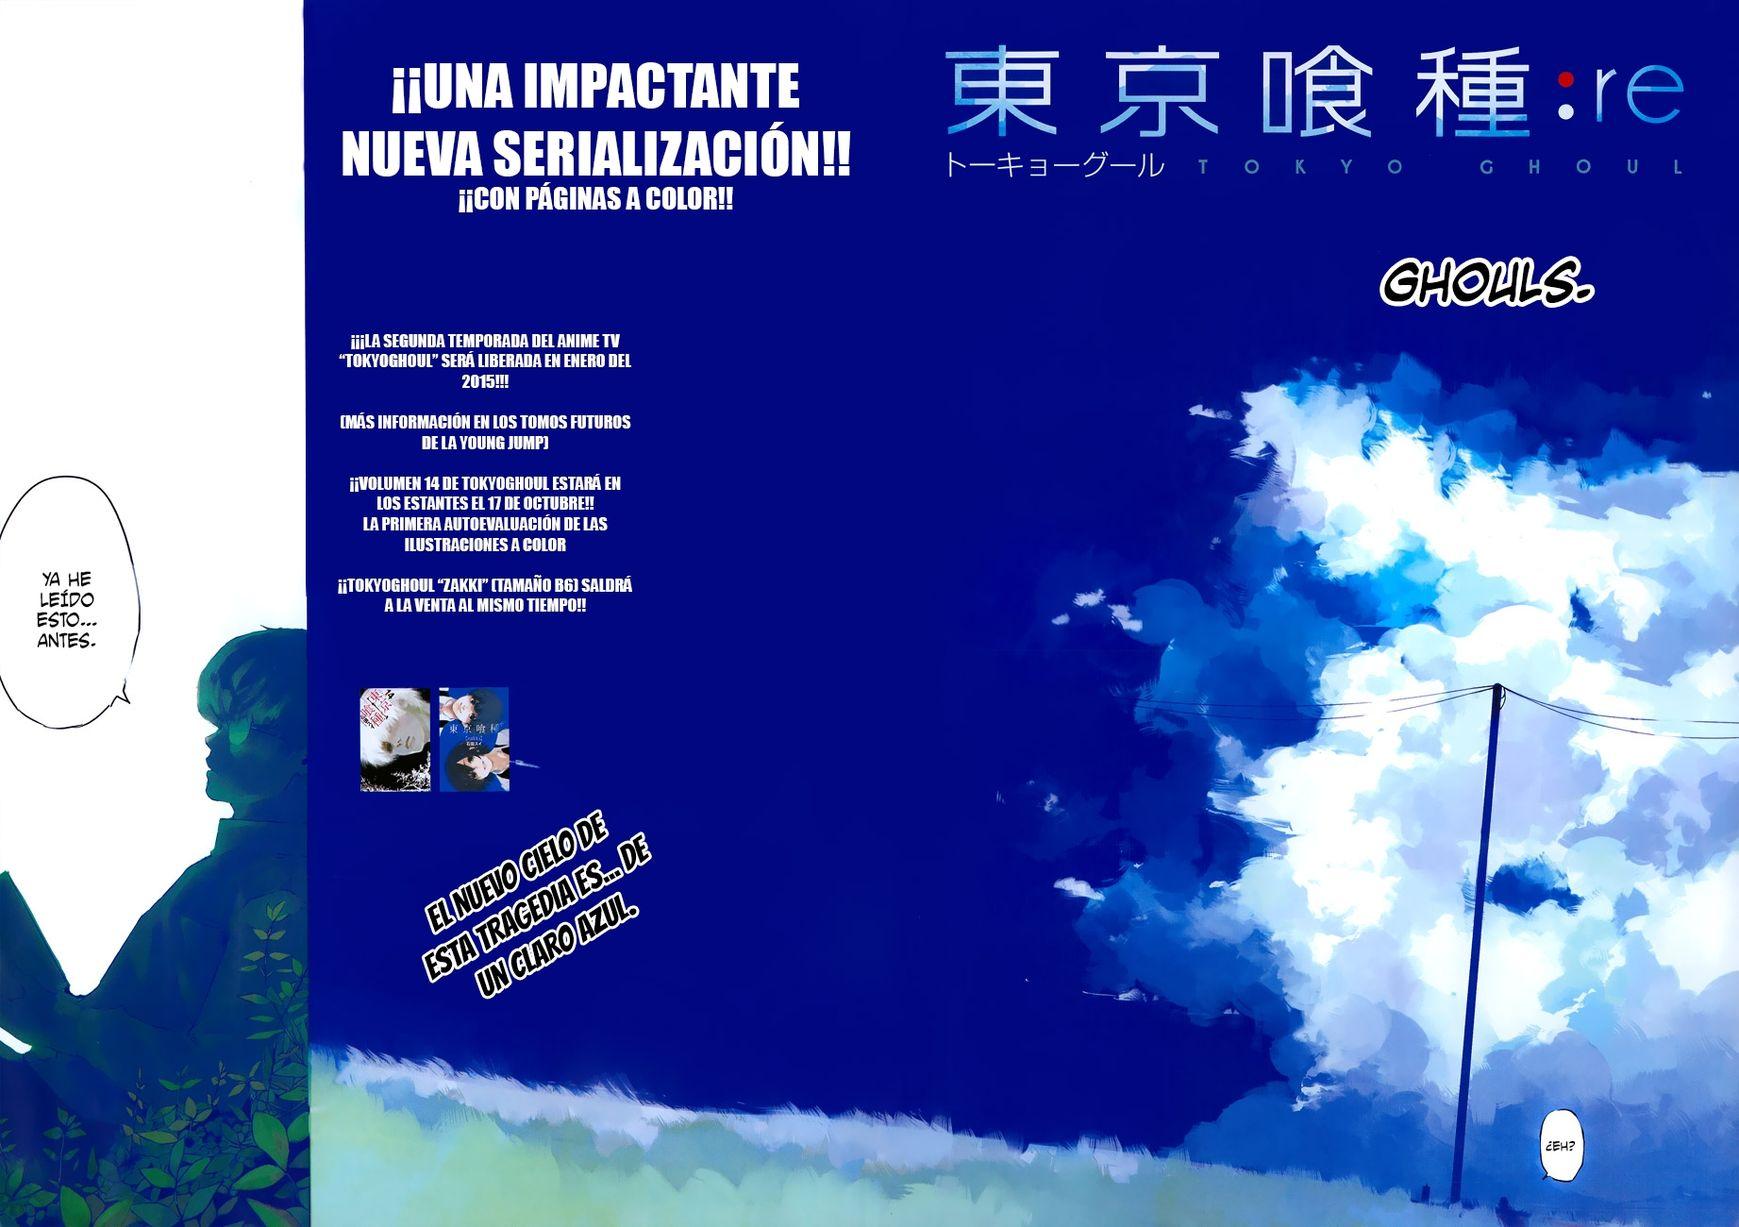 https://c5.ninemanga.com/es_manga/59/59/191644/00482b9bed15a272730fcb590ffebddd.jpg Page 6